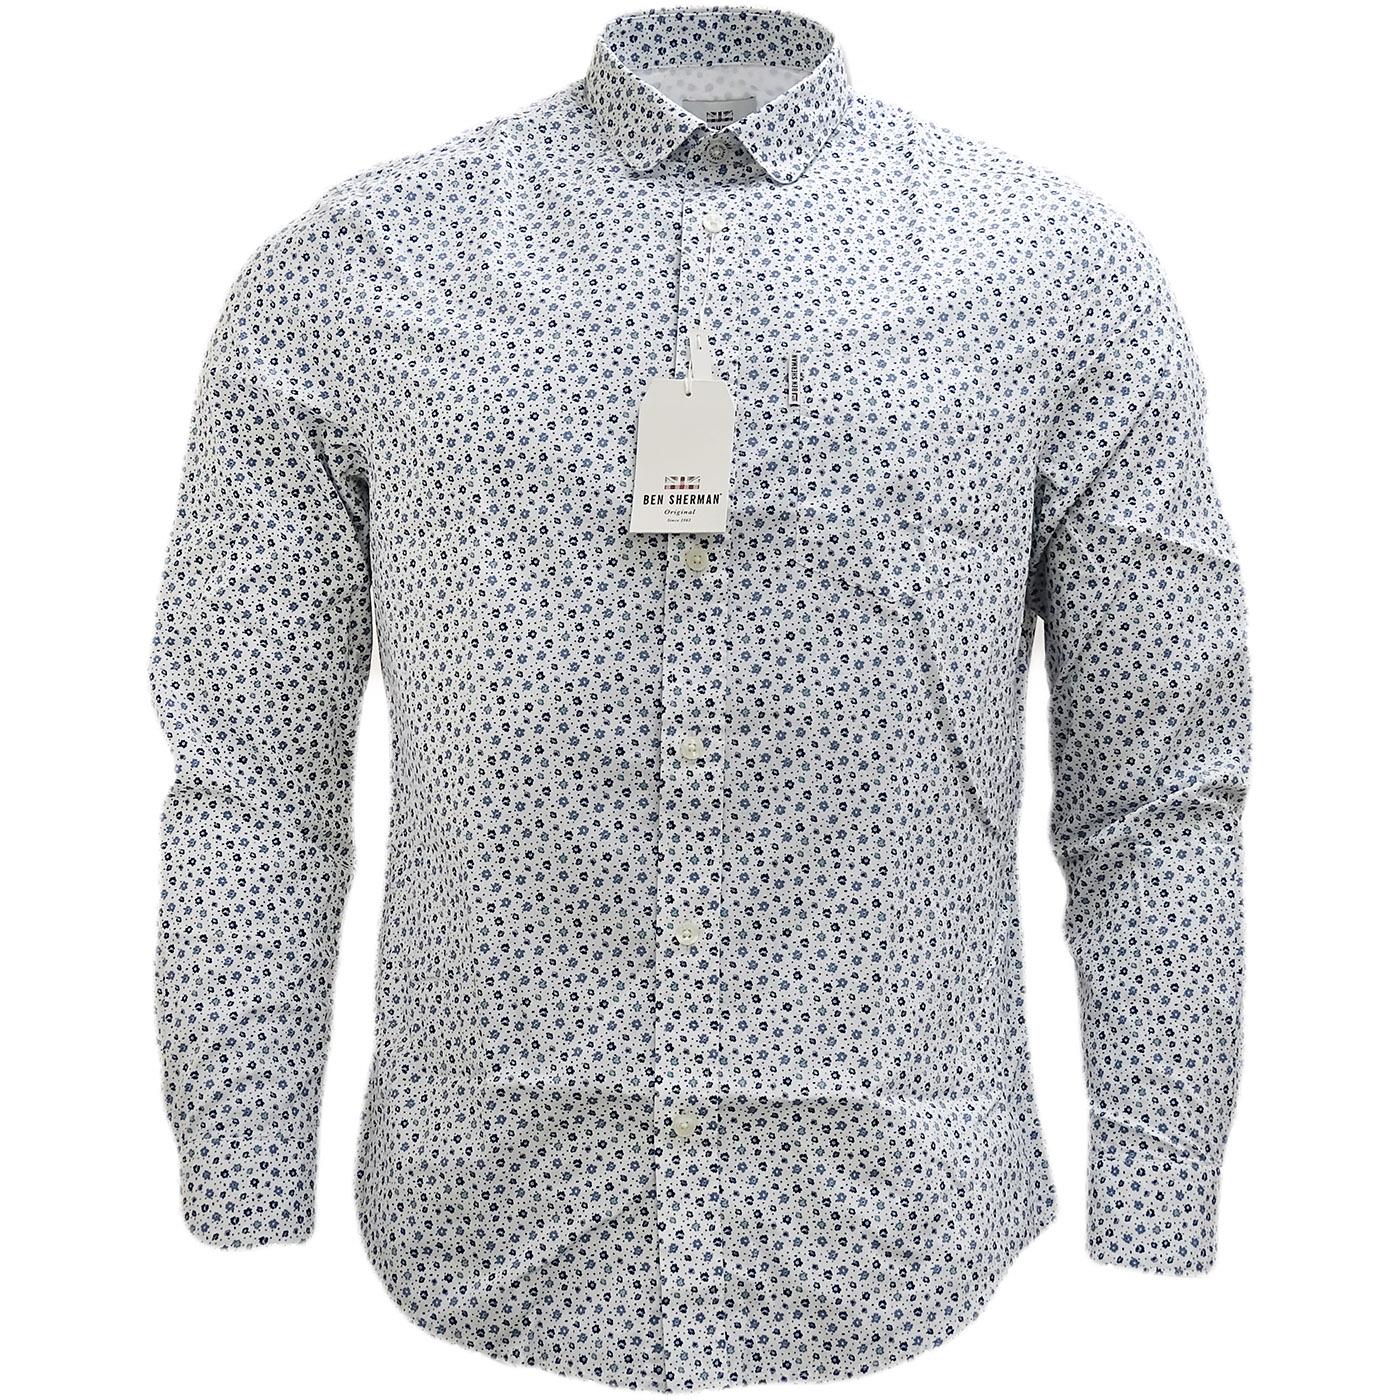 Ben Sherman White Retro Floral Shirt White